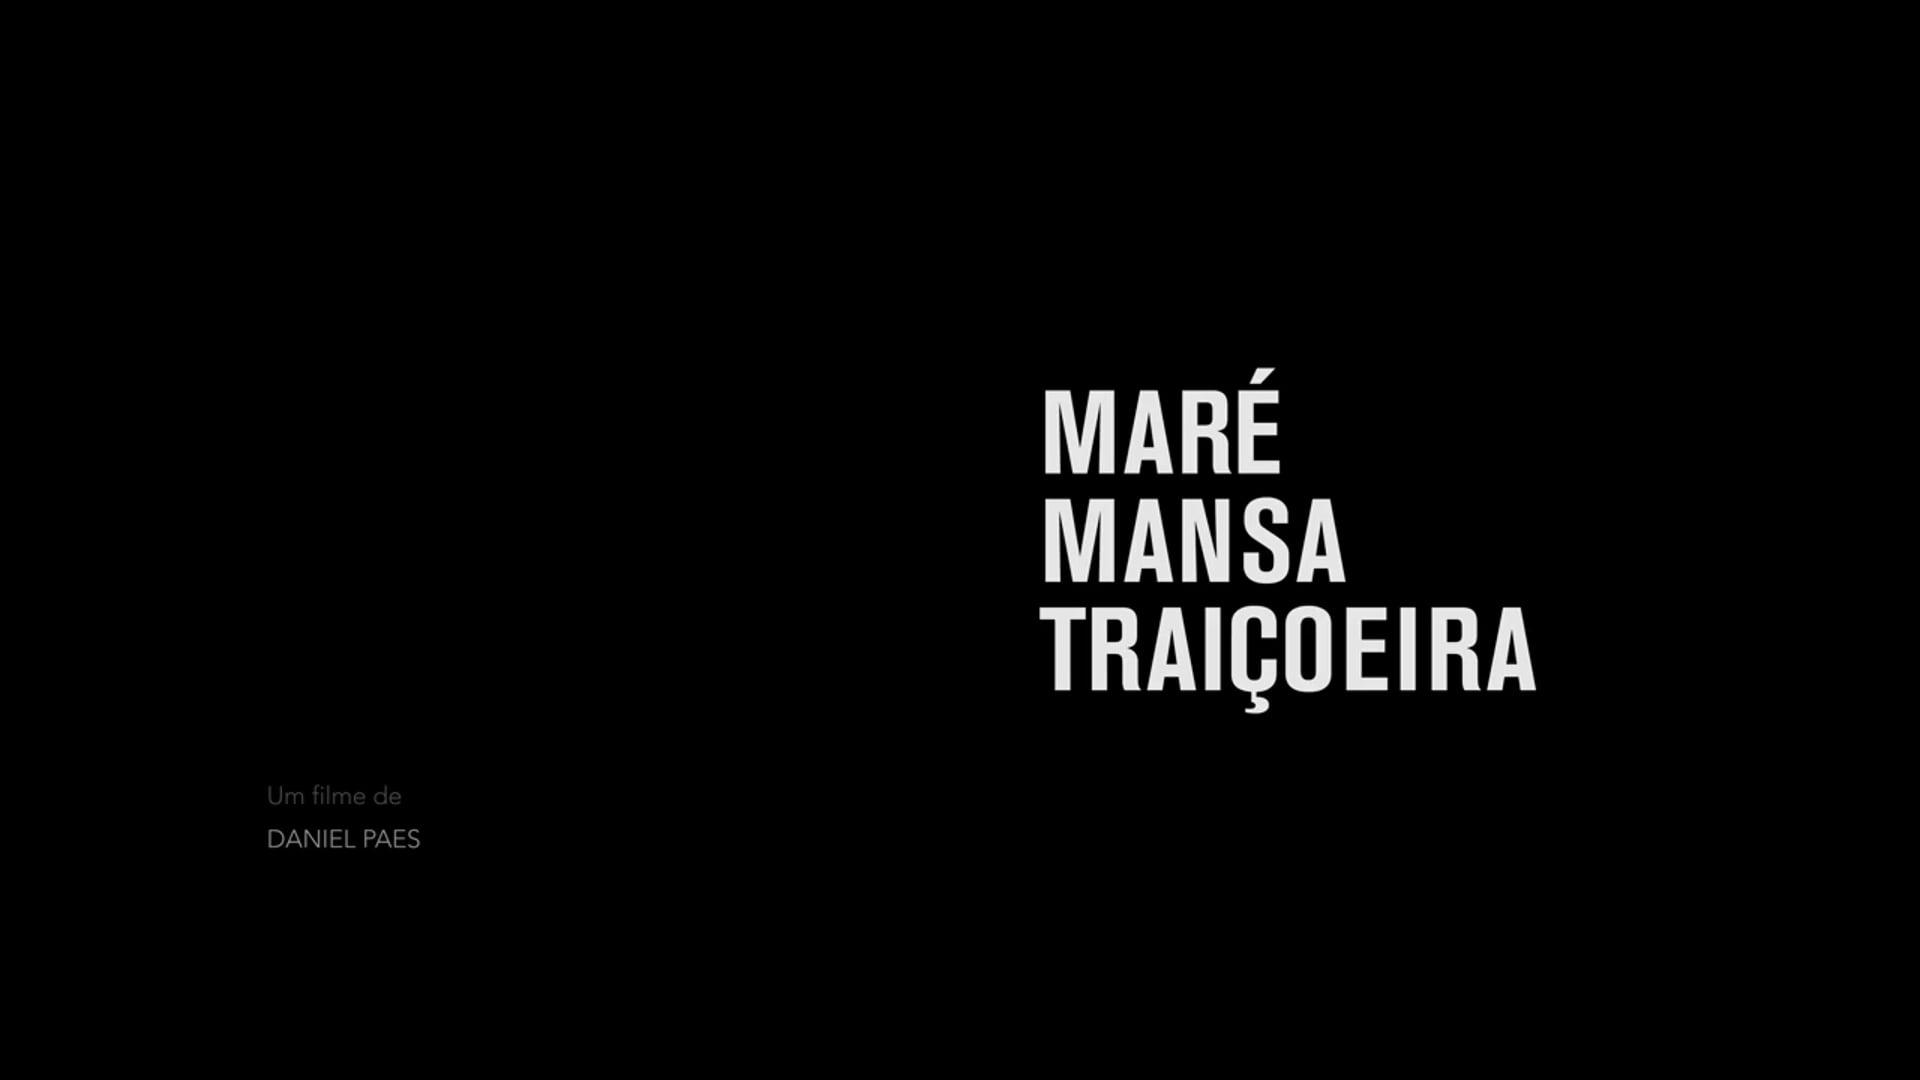 Maré Mansa Traiçoeira | Curta-metragem | 2020